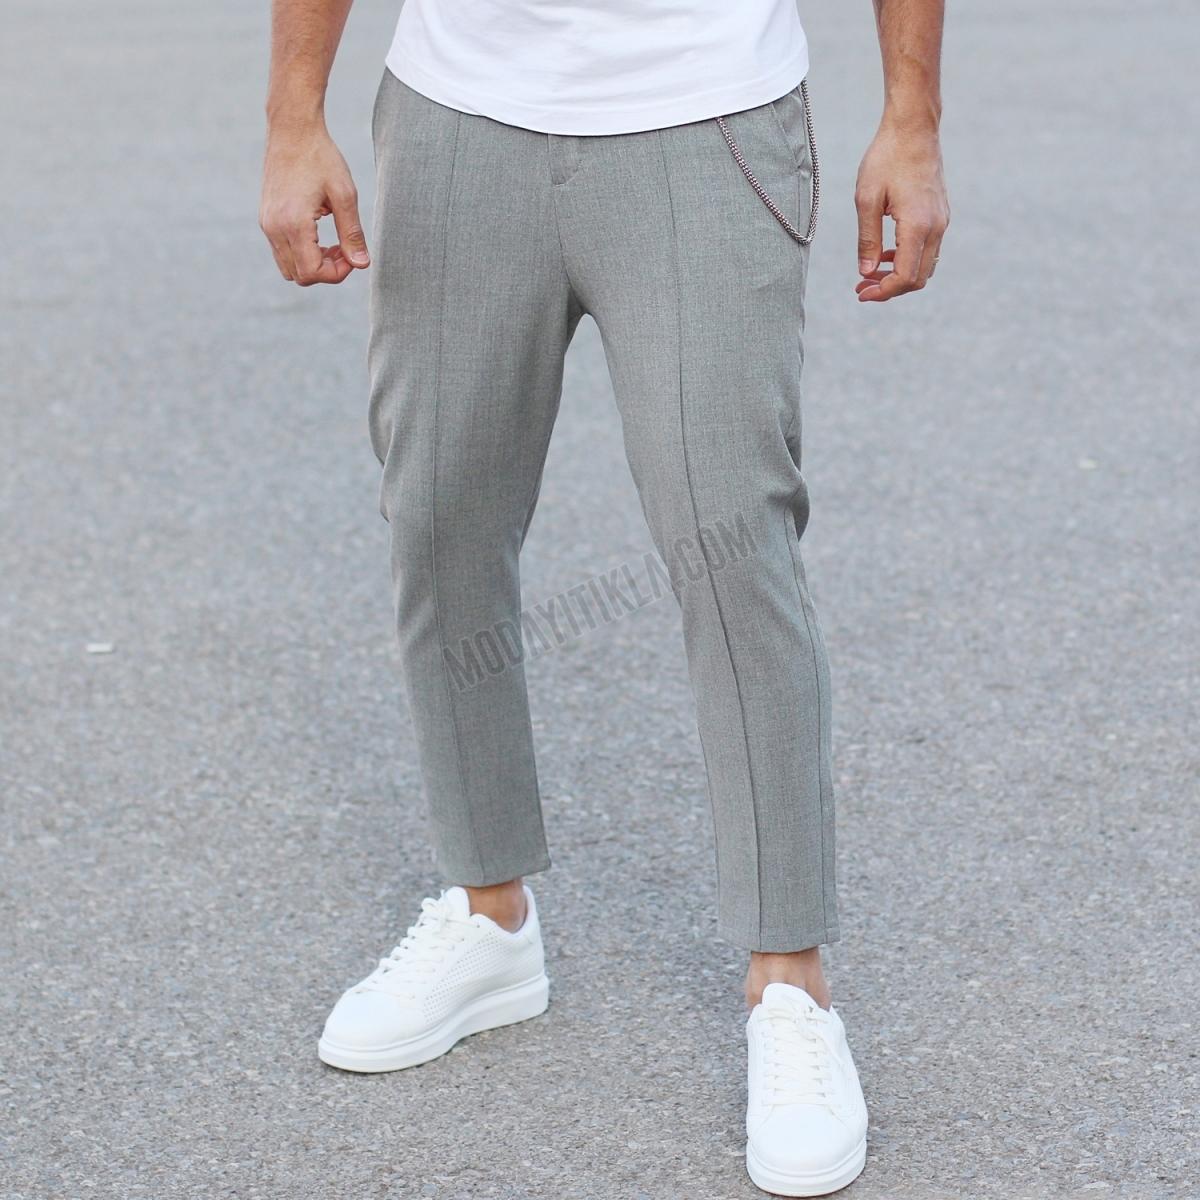 Erkek Zincirli Gri Carrot Fit Pantolon